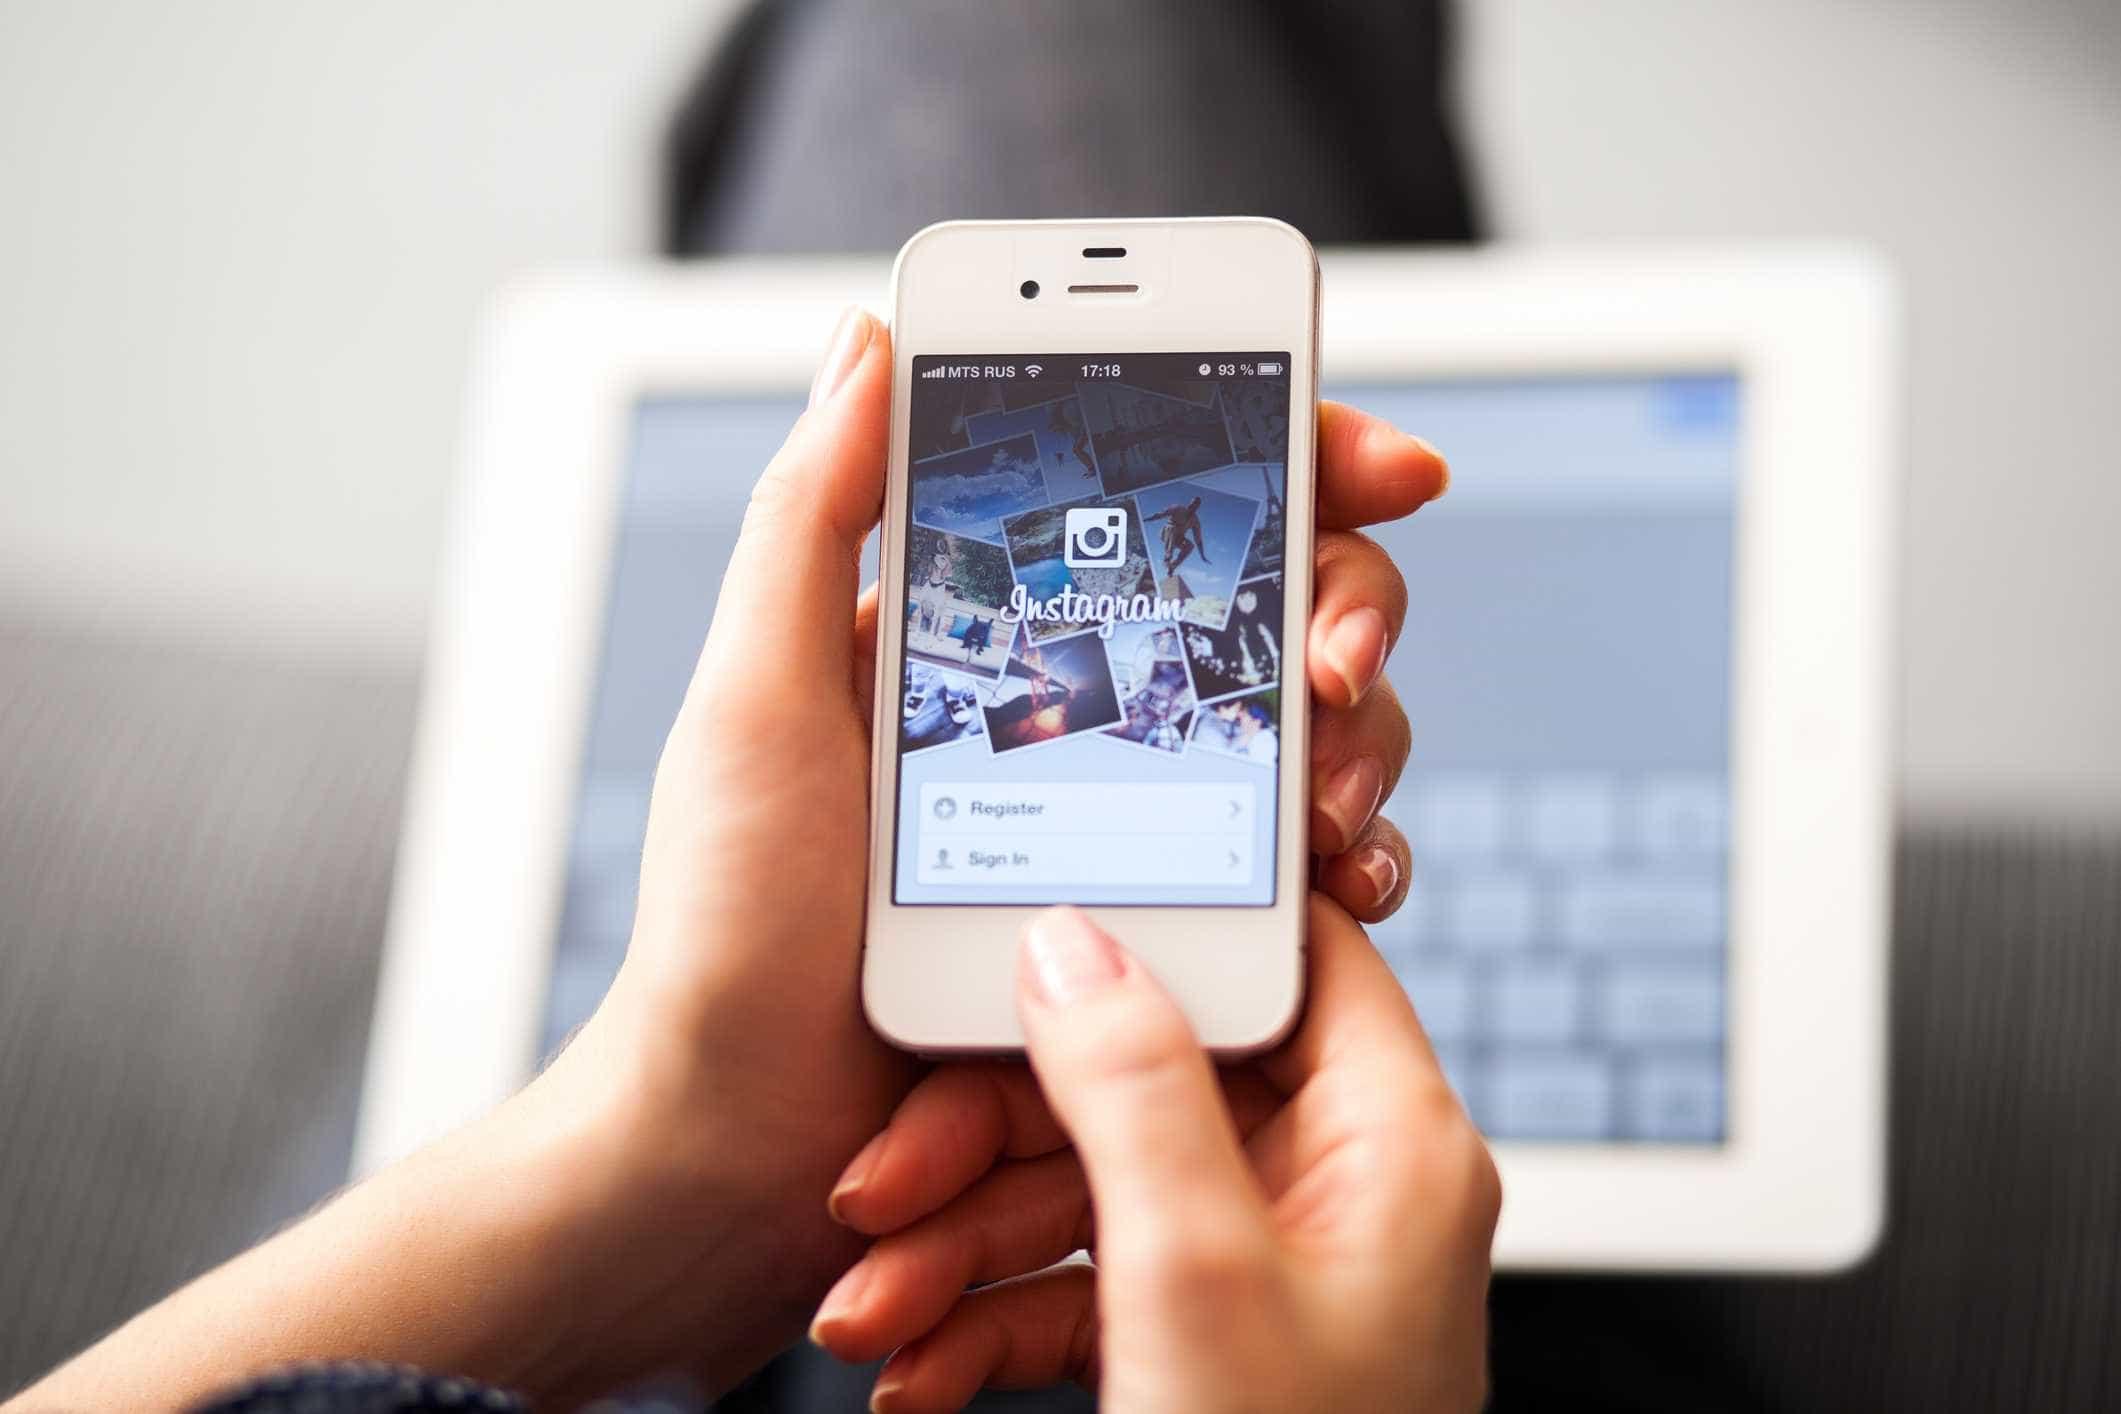 Instagram cria ferramenta para limitar bullying